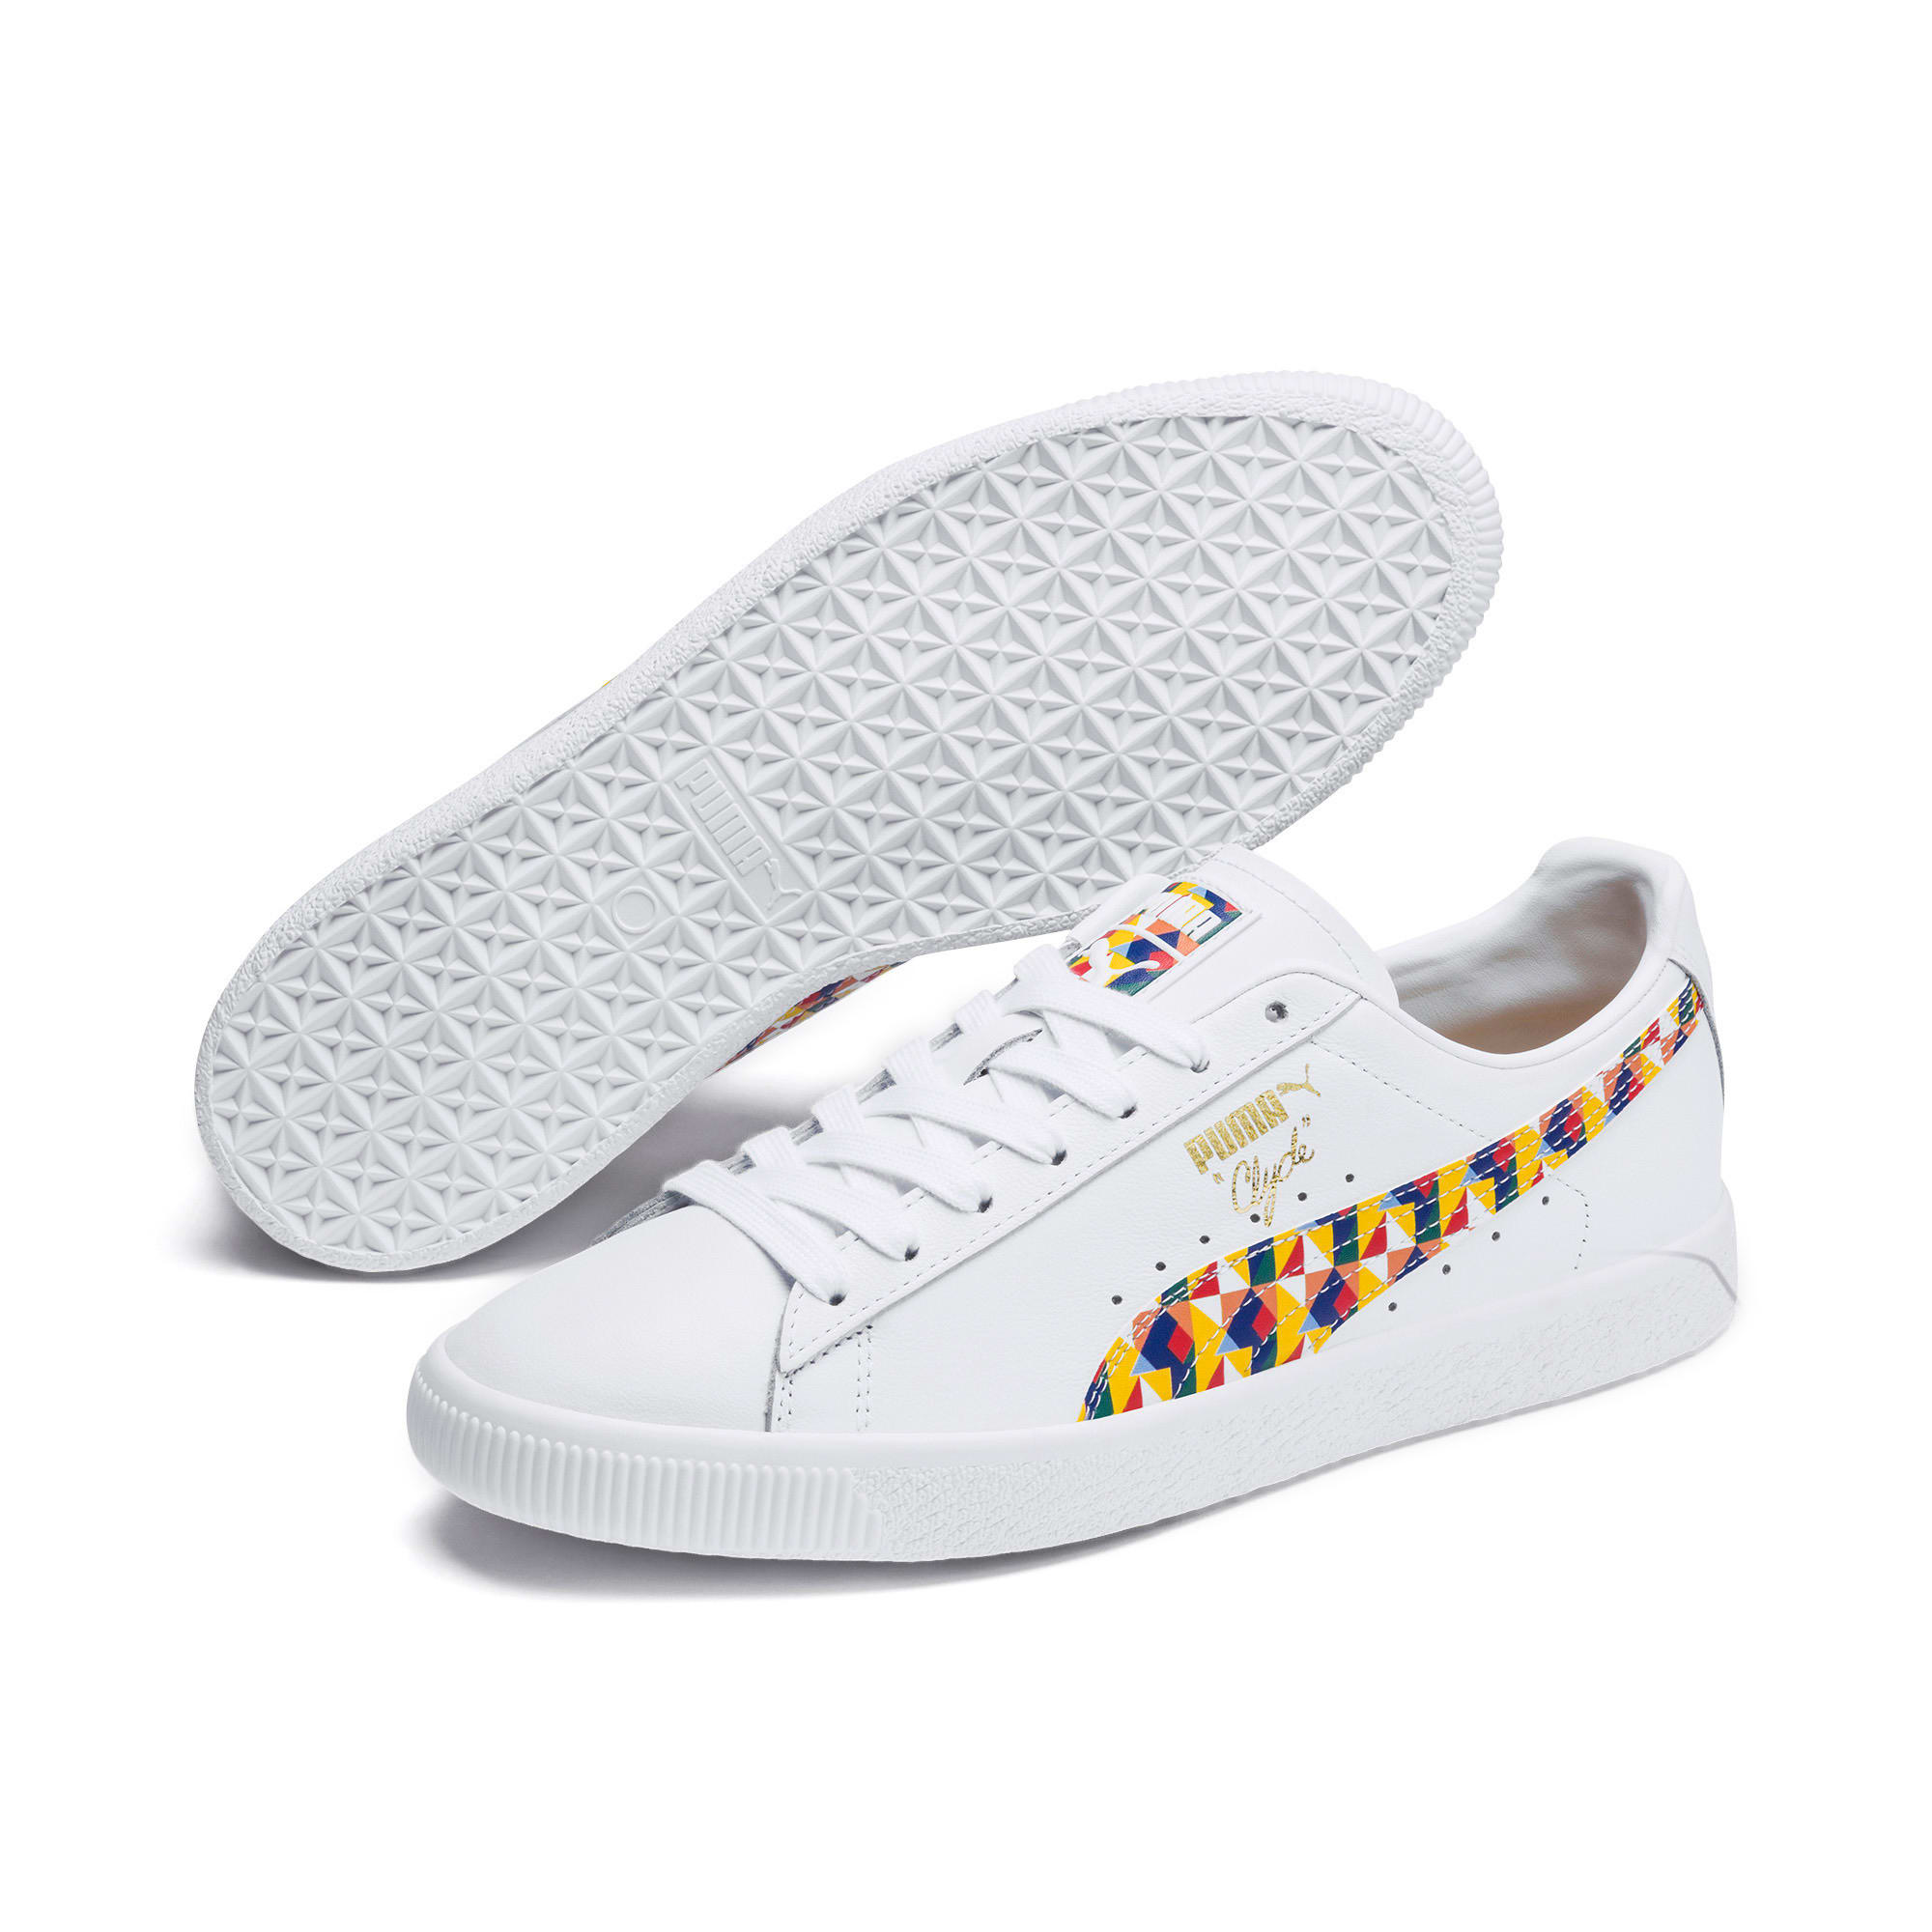 super popular dd9e7 4f362 Clyde Graffiti Sneakers